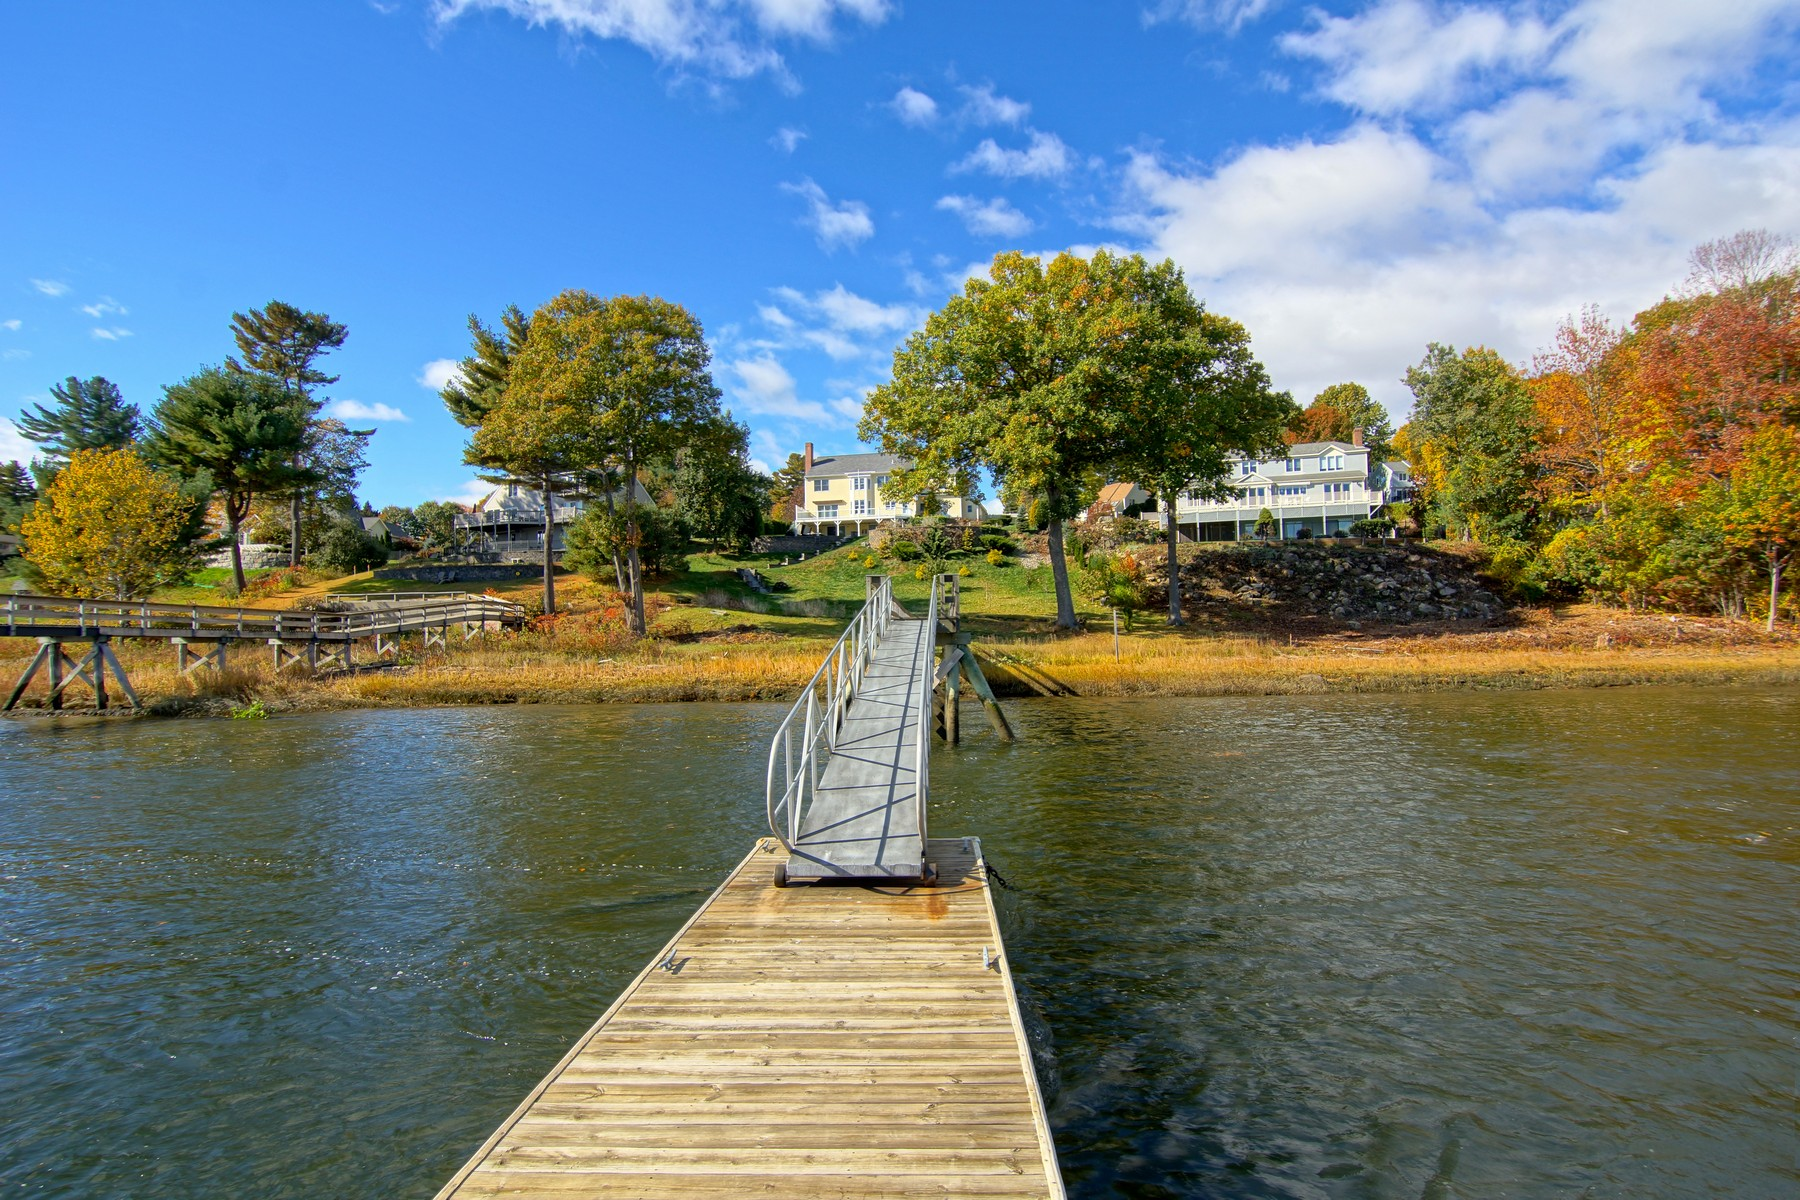 Maison unifamiliale pour l Vente à Direct Waterfront Residence with Deep-water Dock at Landing Way 13 Landing Way Dover, New Hampshire, 03820 États-Unis